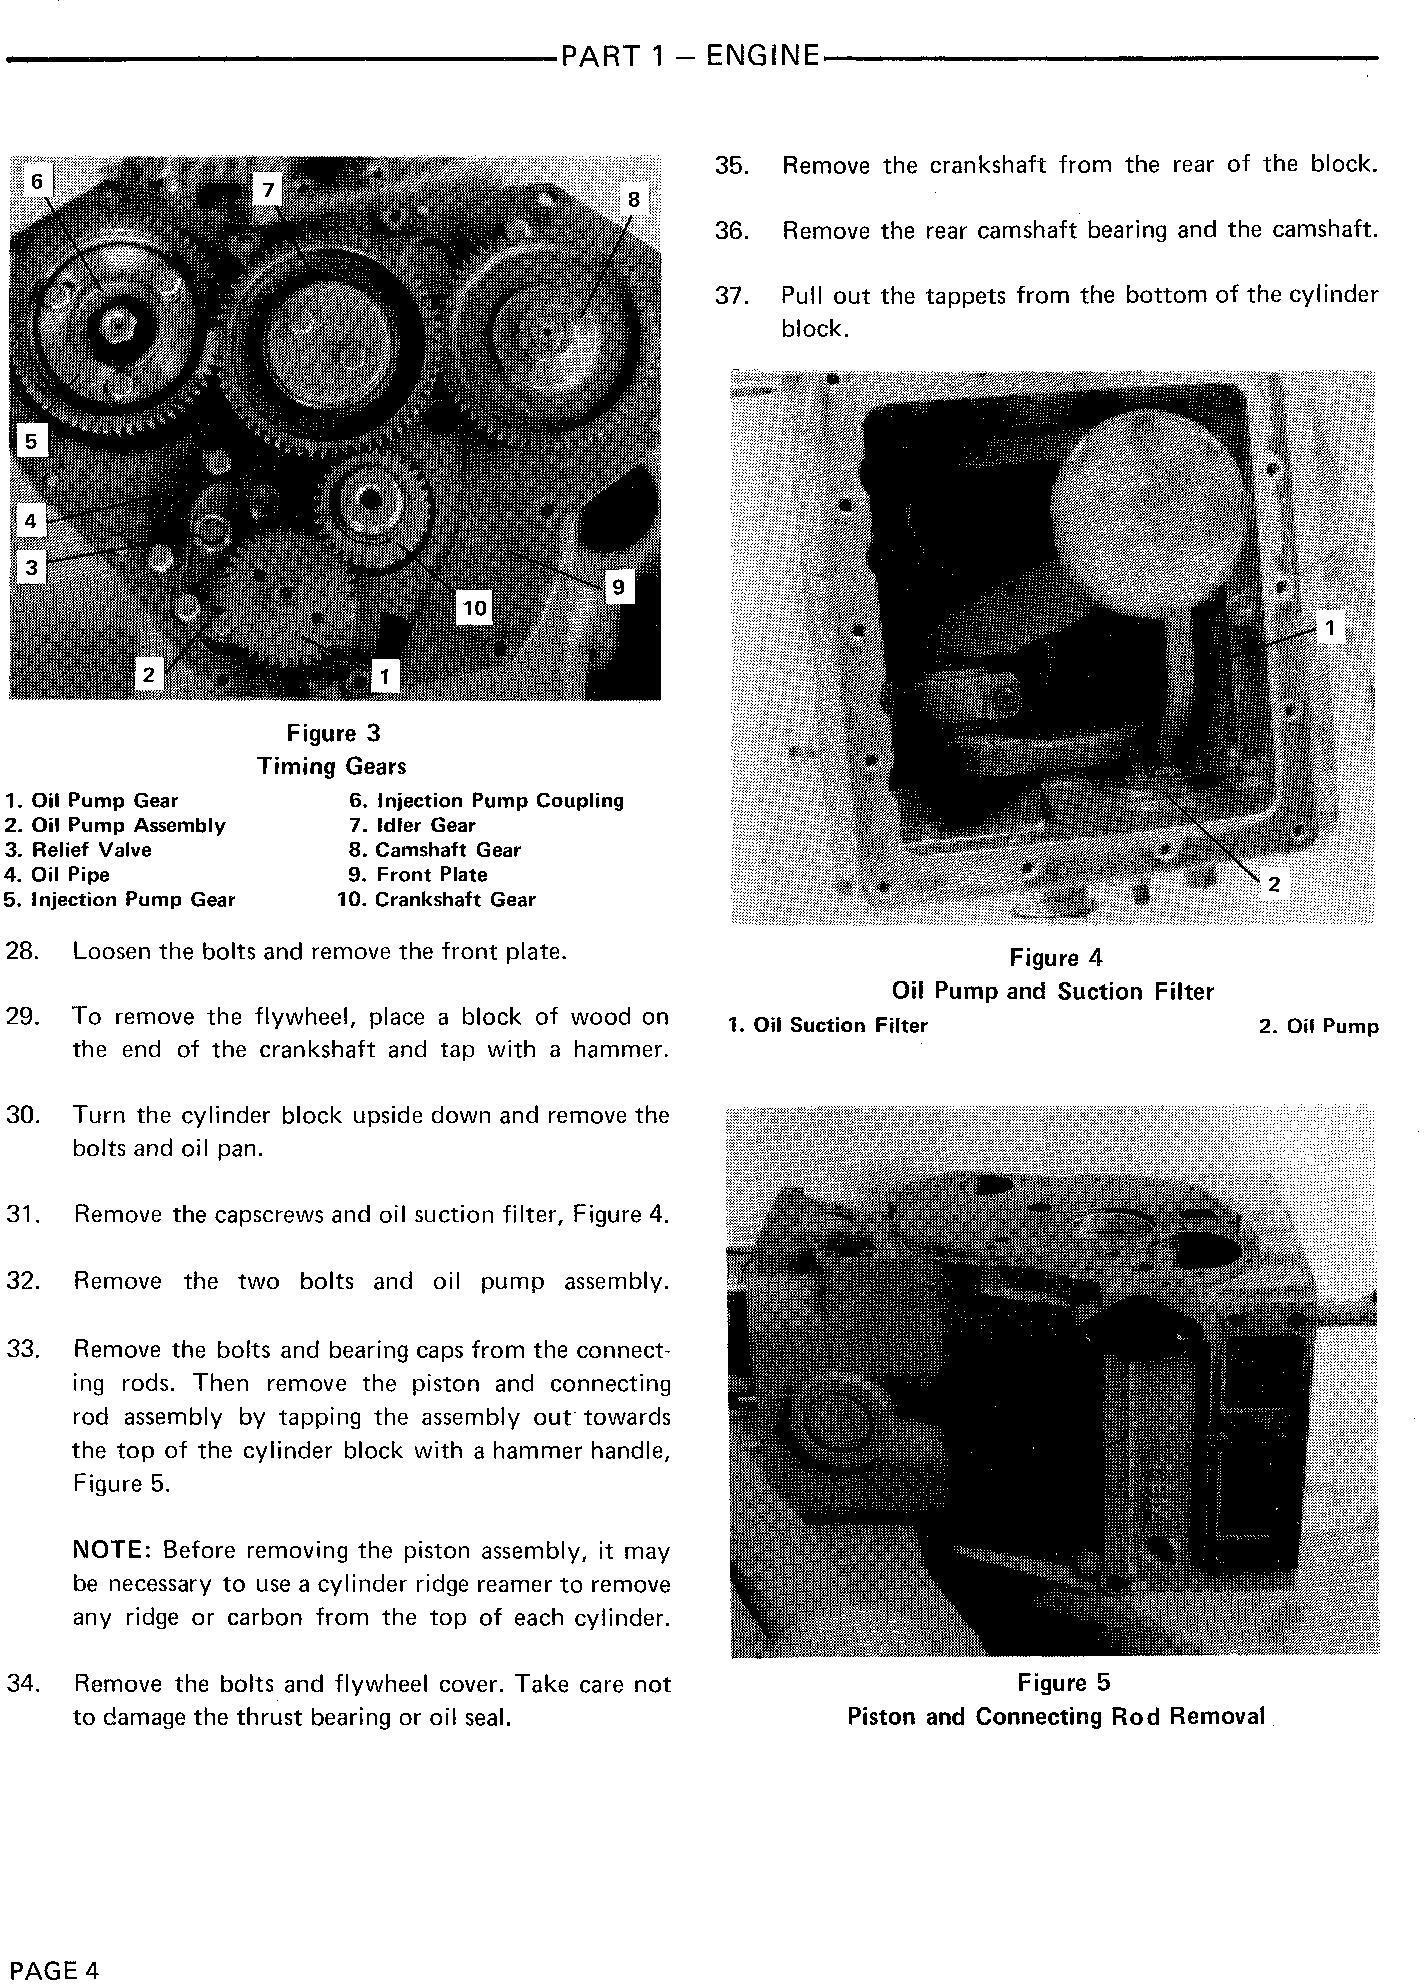 Ford 1000, 1600 Tractor Service Repair Manual (SE3414) - 1